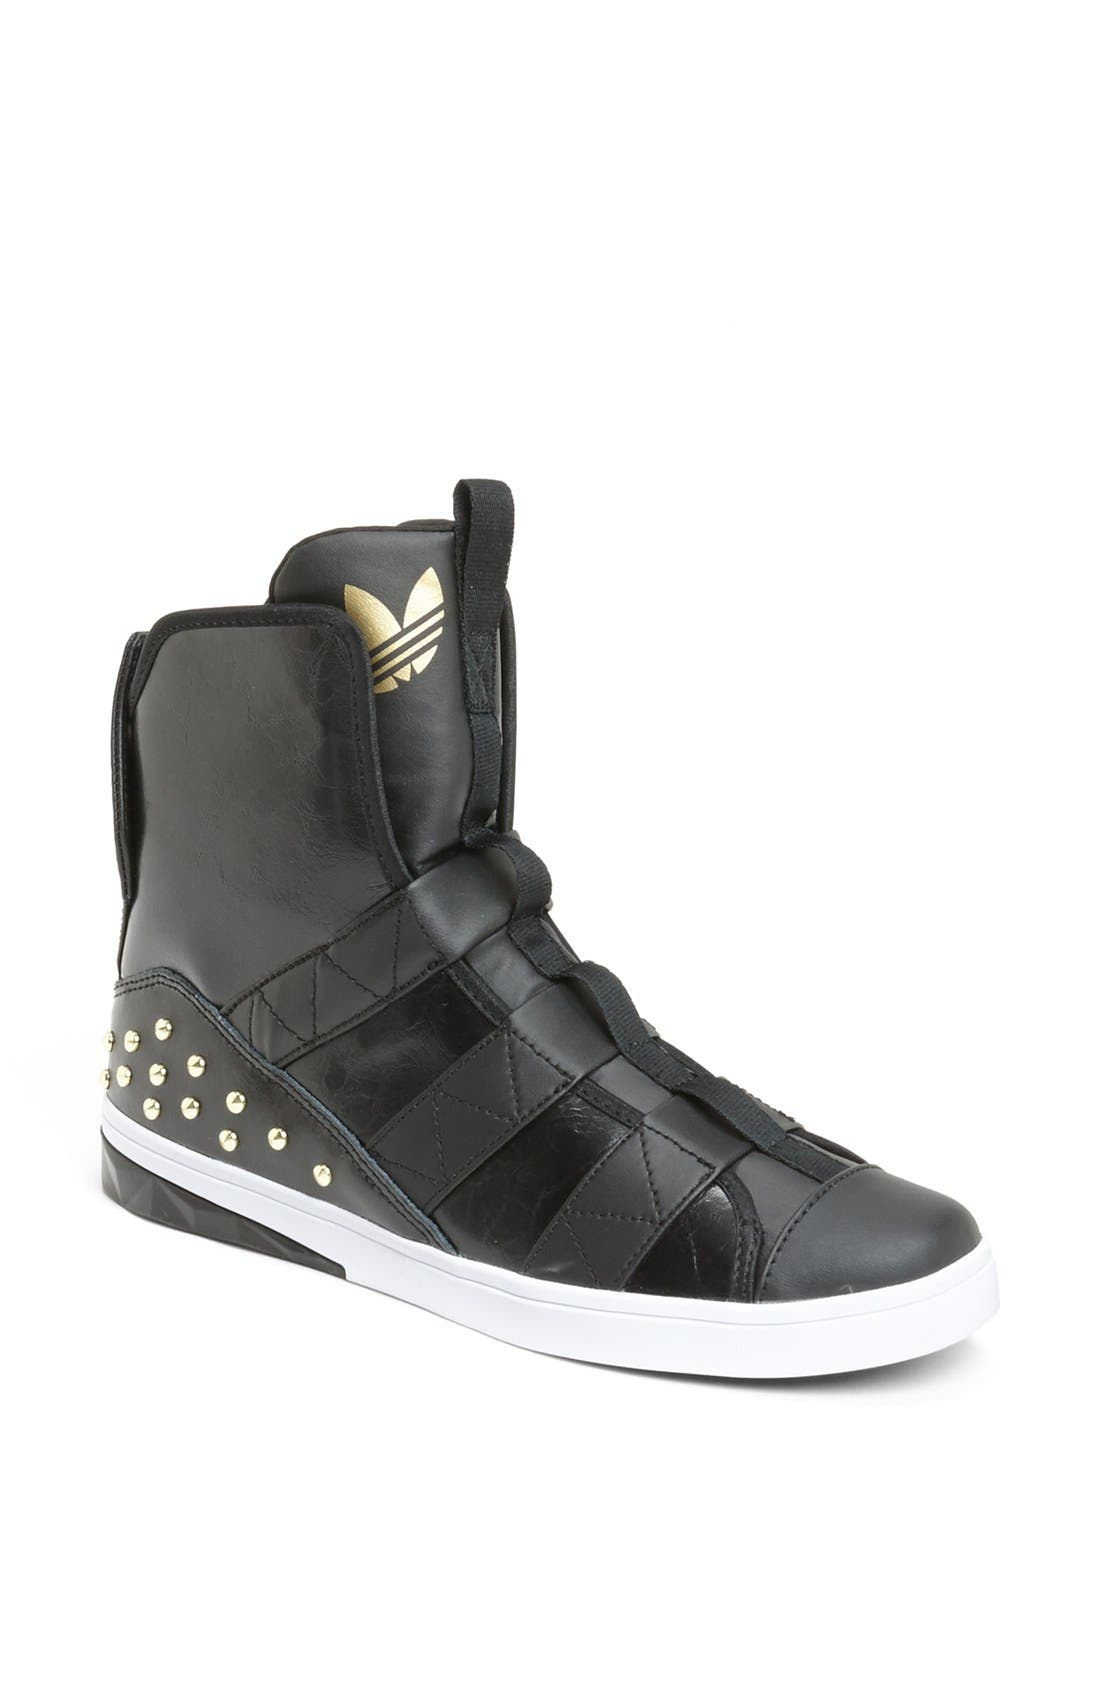 Main Image - adidas 'Chic High' Sneaker (Women)